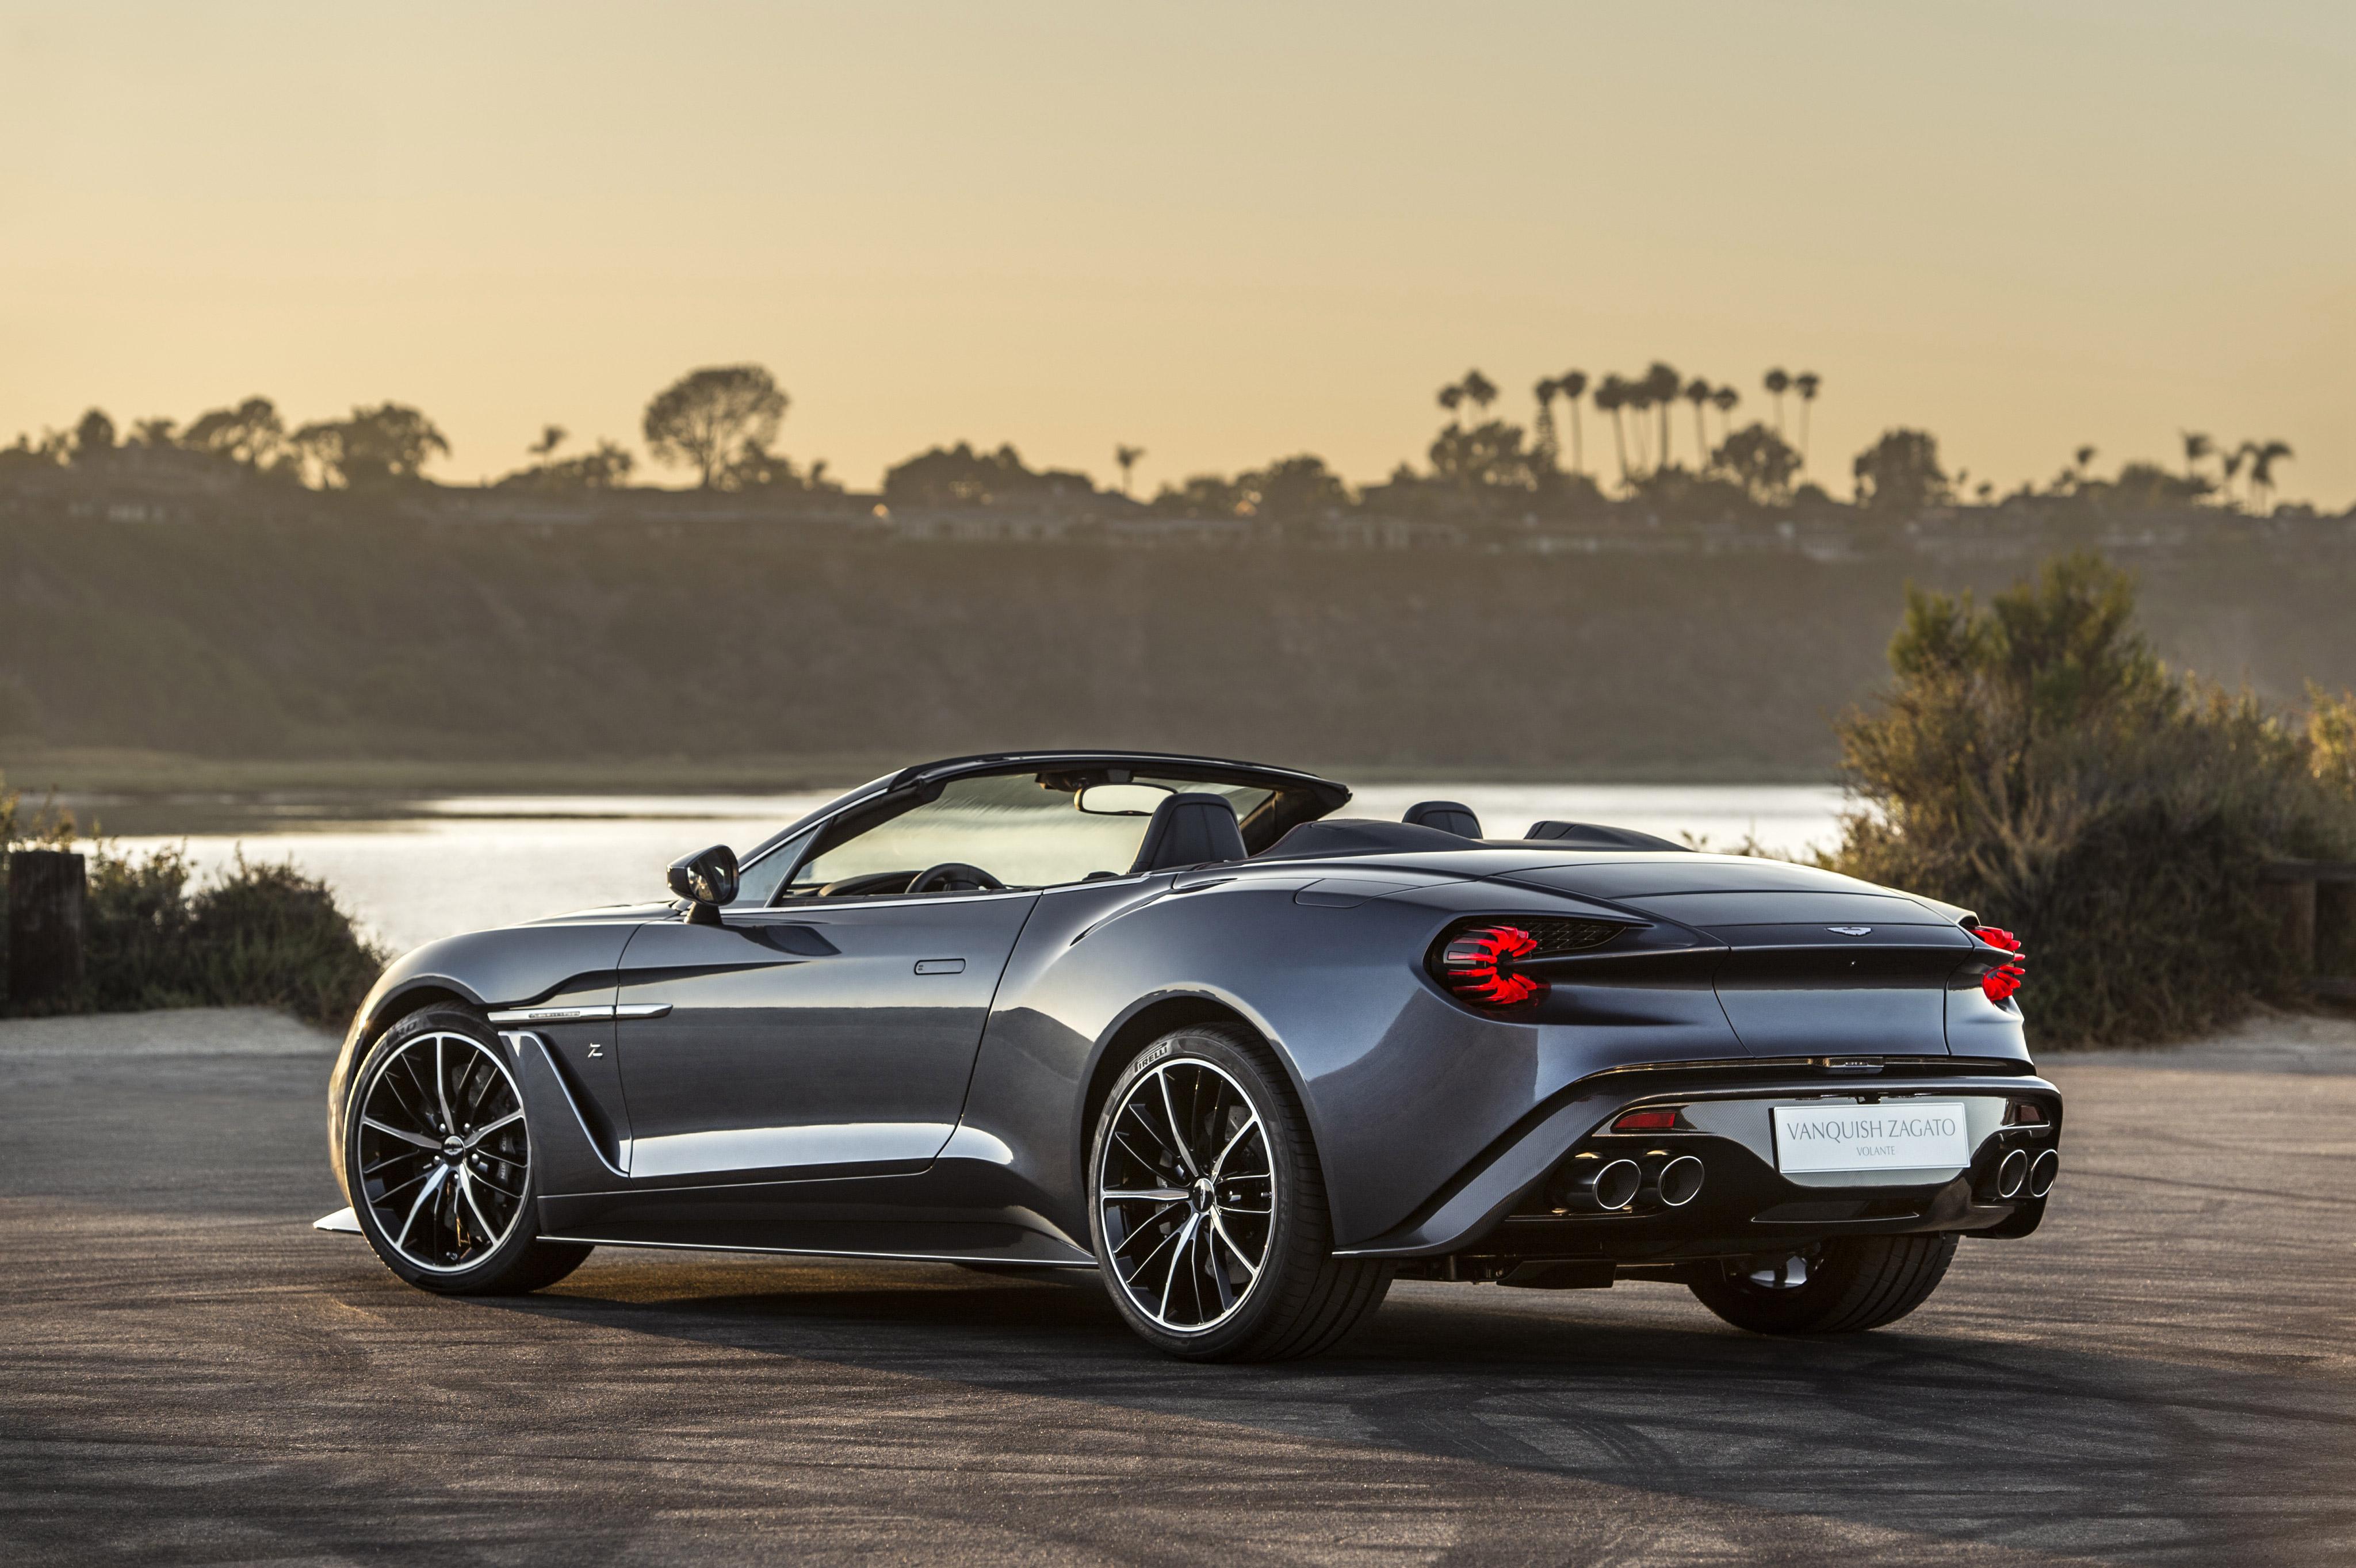 Aston Martin Vanquish Zagato 4k Hd Cars 4k Wallpapers